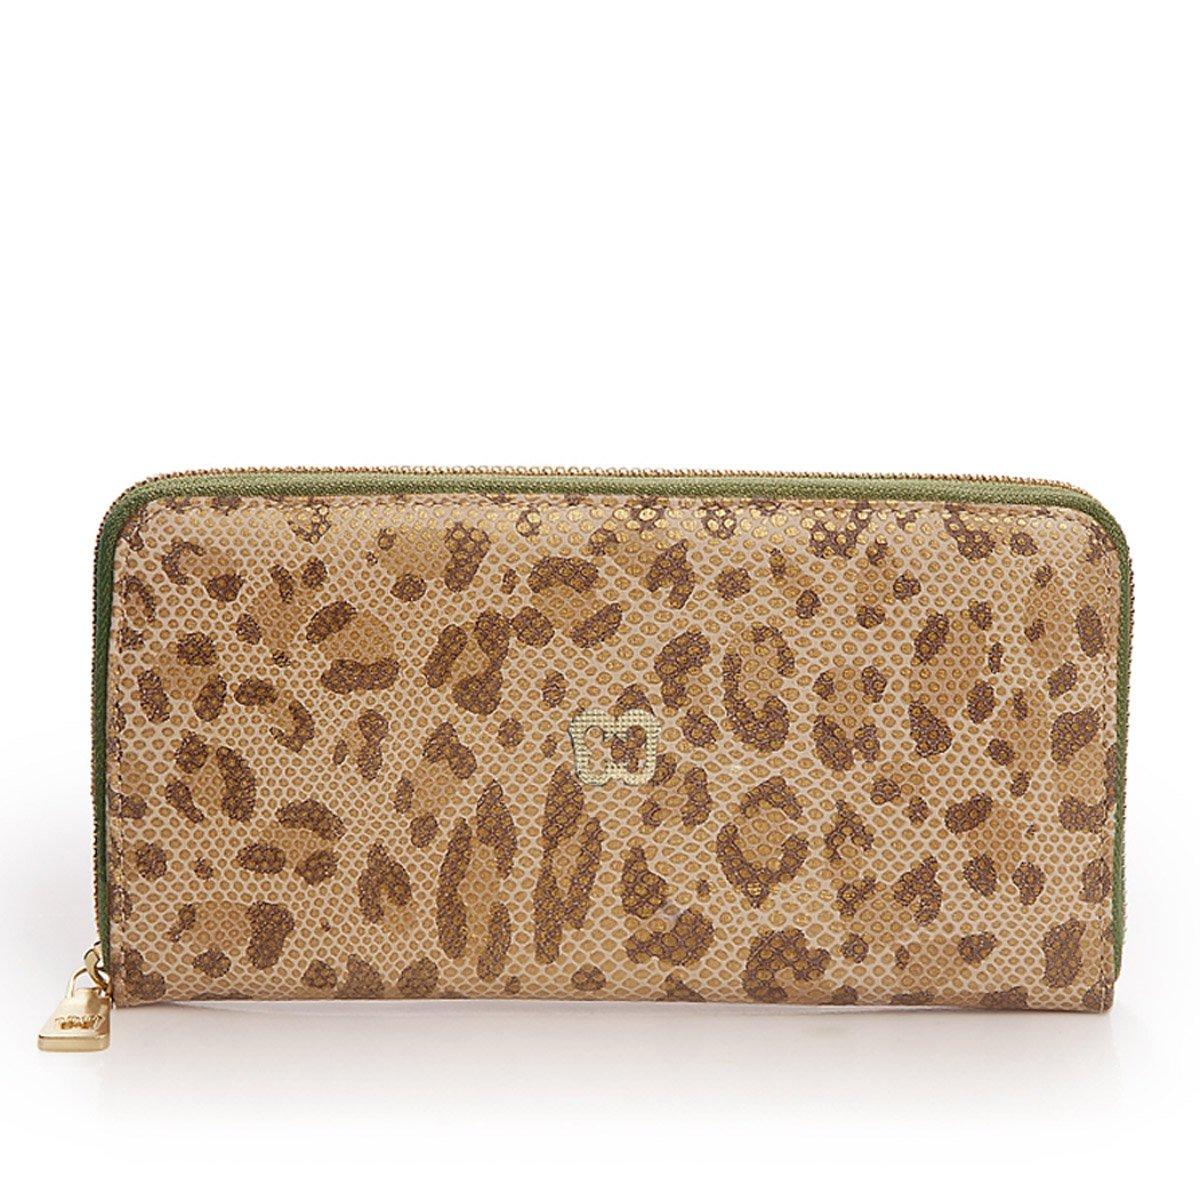 Eric Javits Luxury Fashion Designer Women's Handbag - Zip Wallet - Leopard